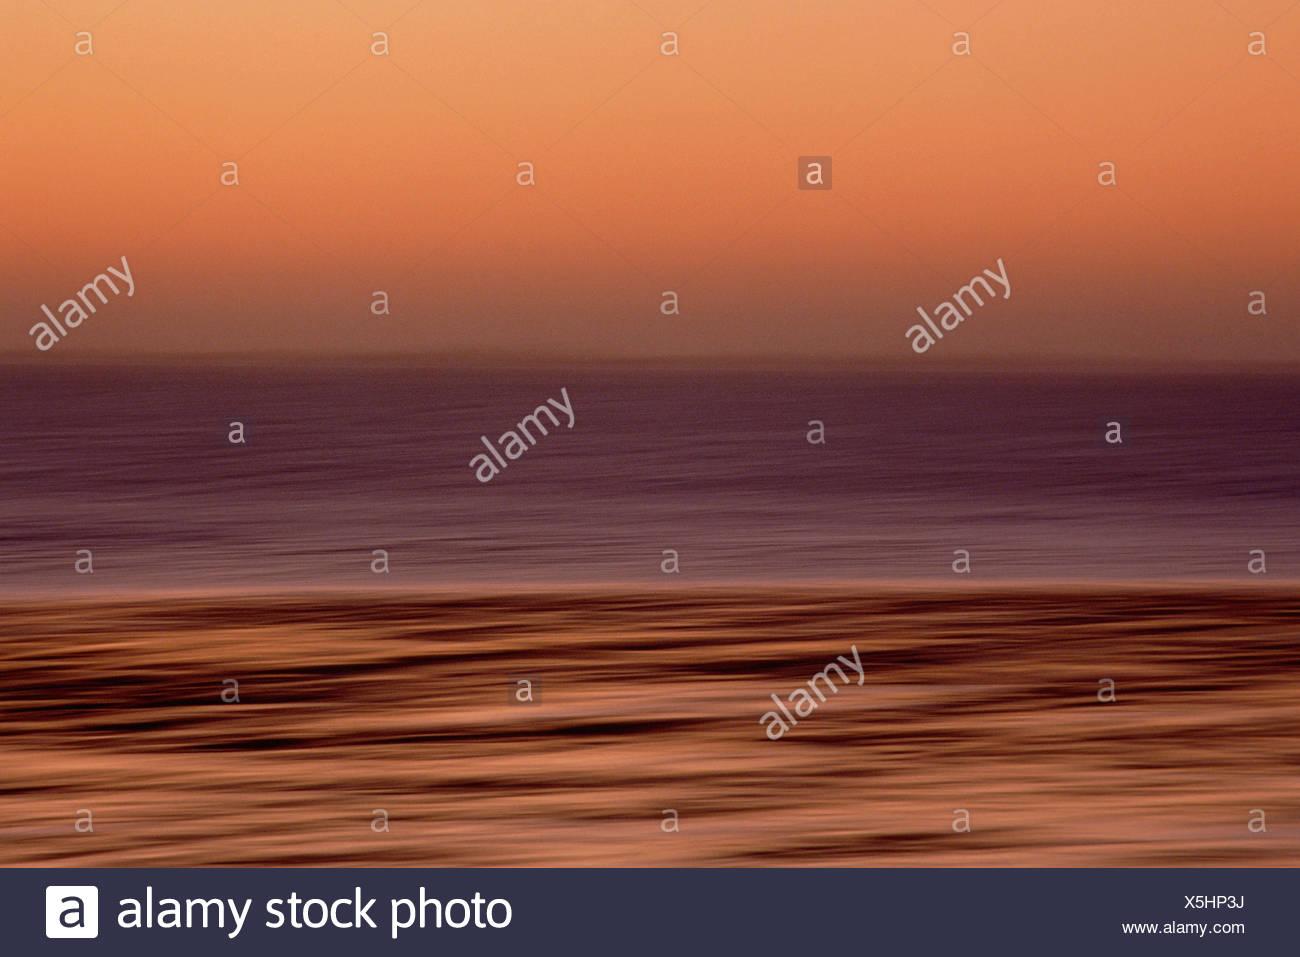 Dawn over ocean horizon. Photographic art abstract. - Stock Image